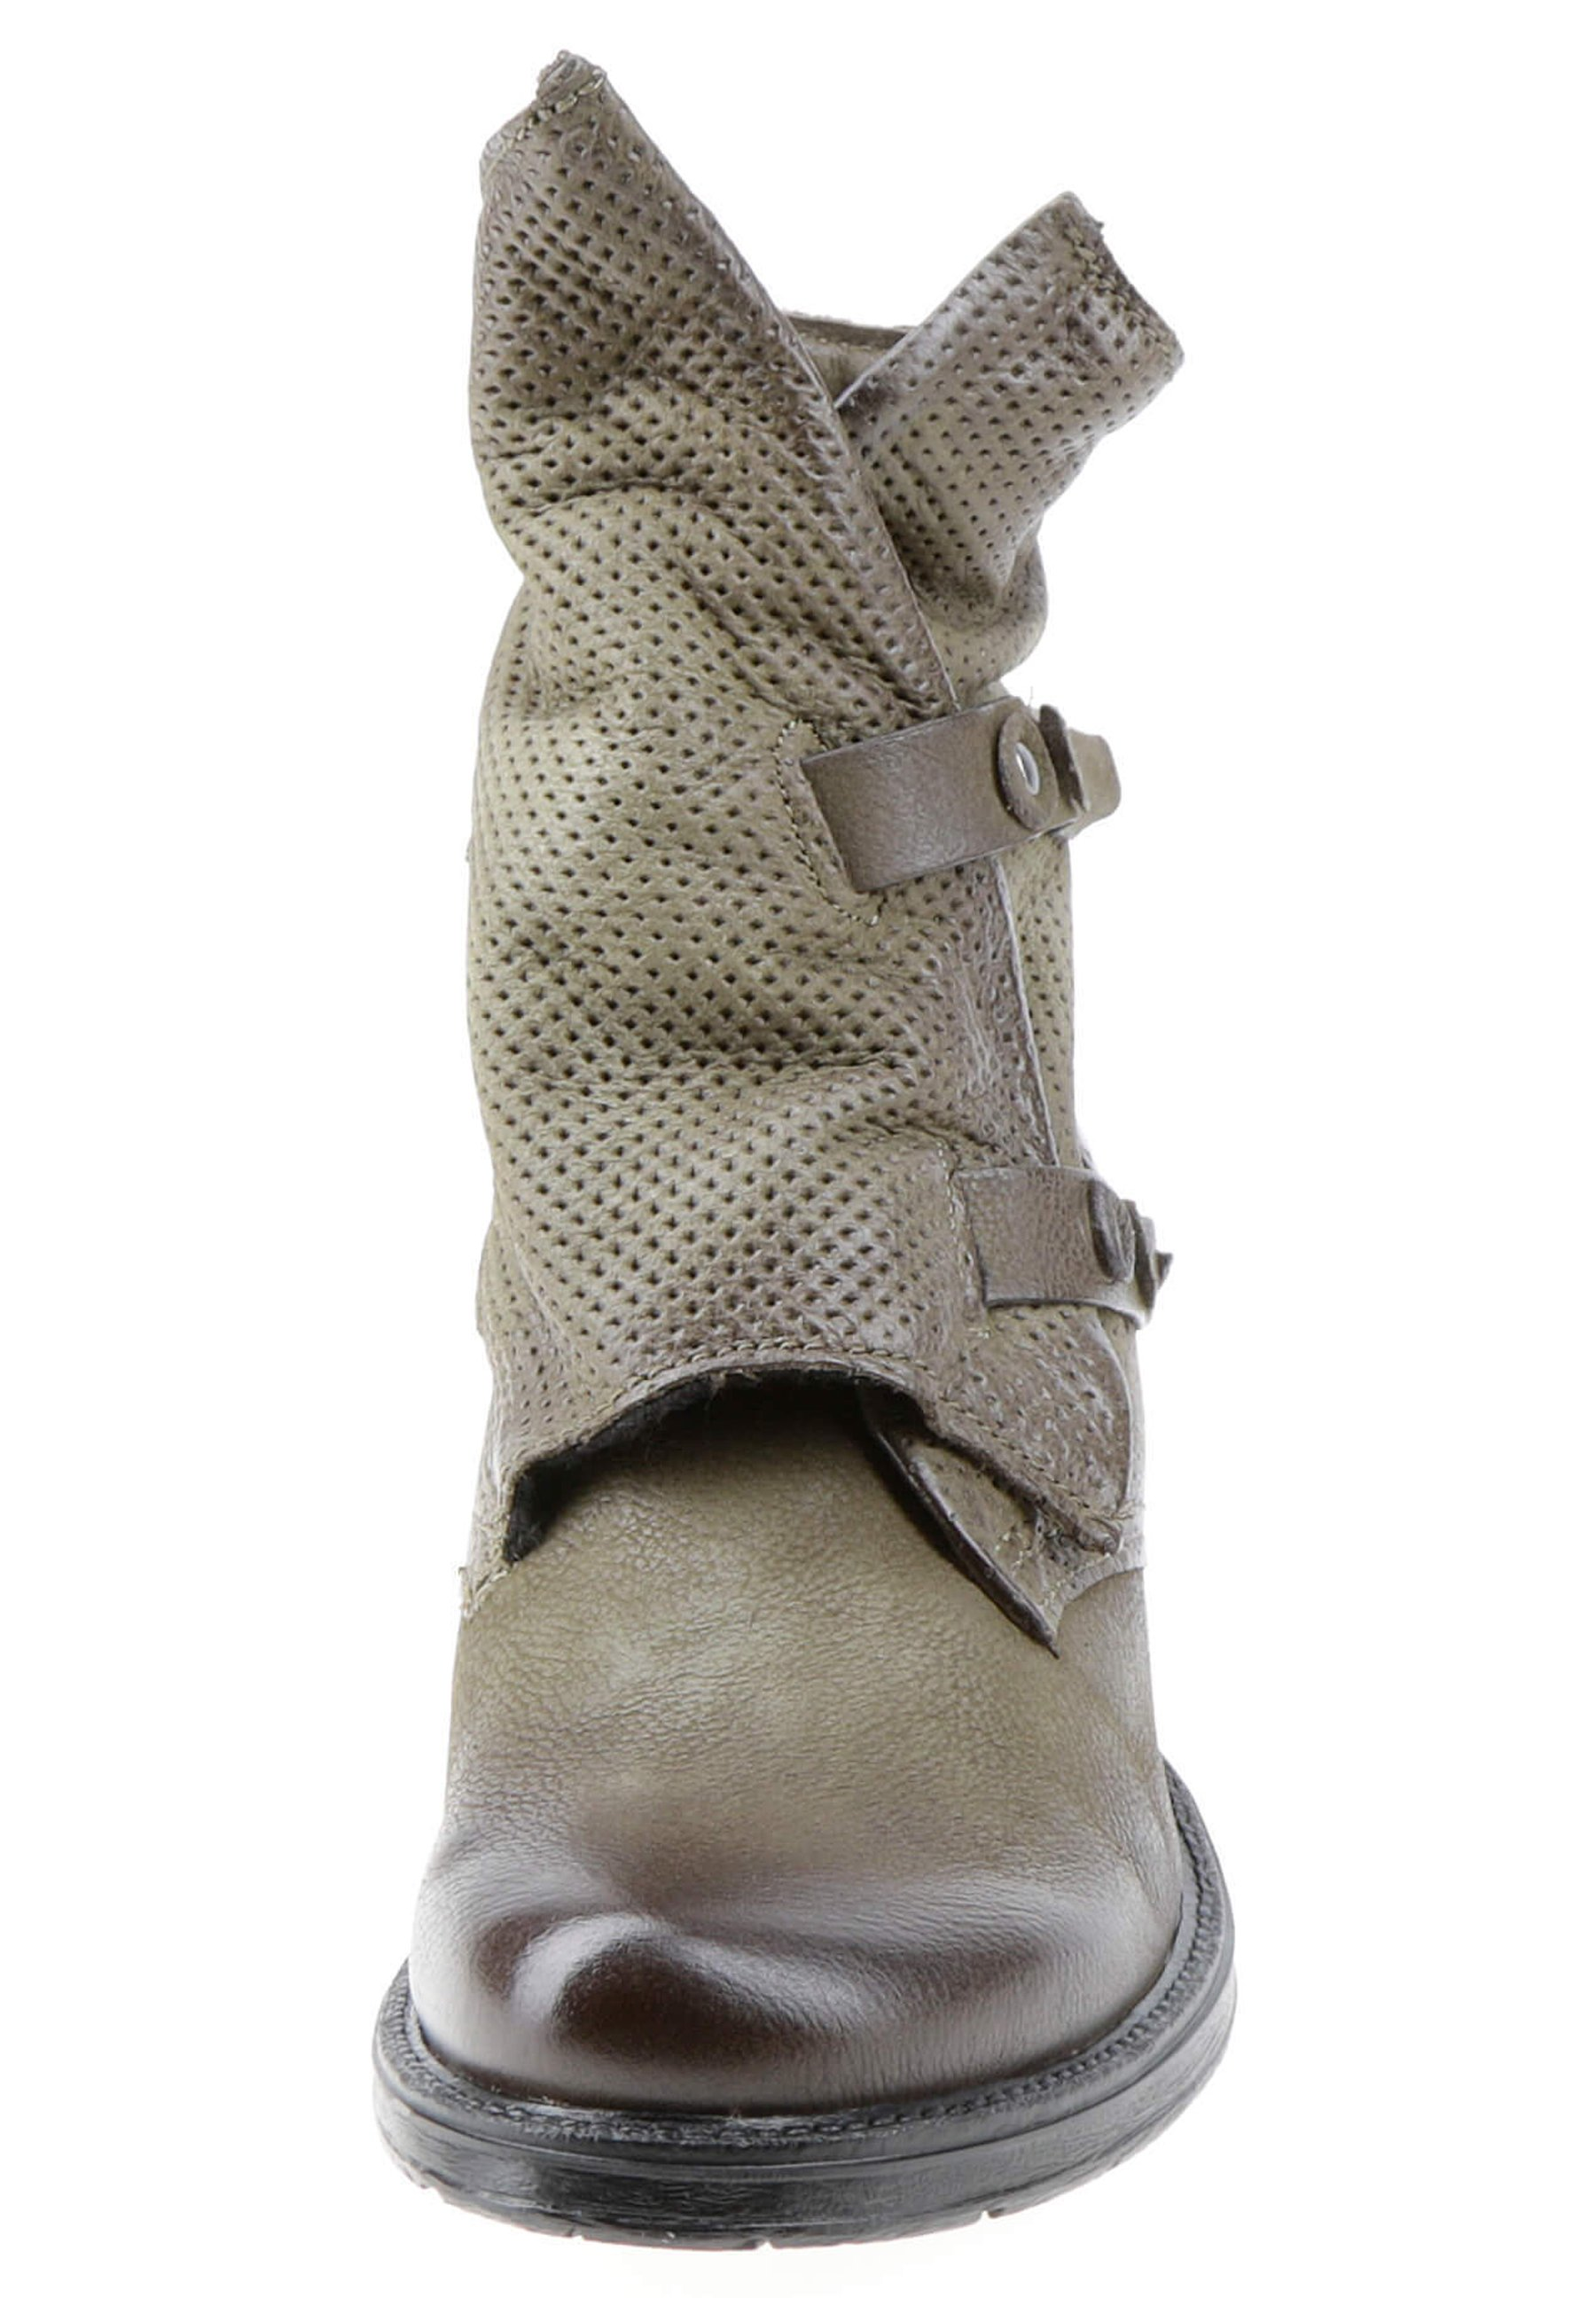 MJUS Cowboy-/Bikerstiefelette - safari | Damen Schuhe 2020